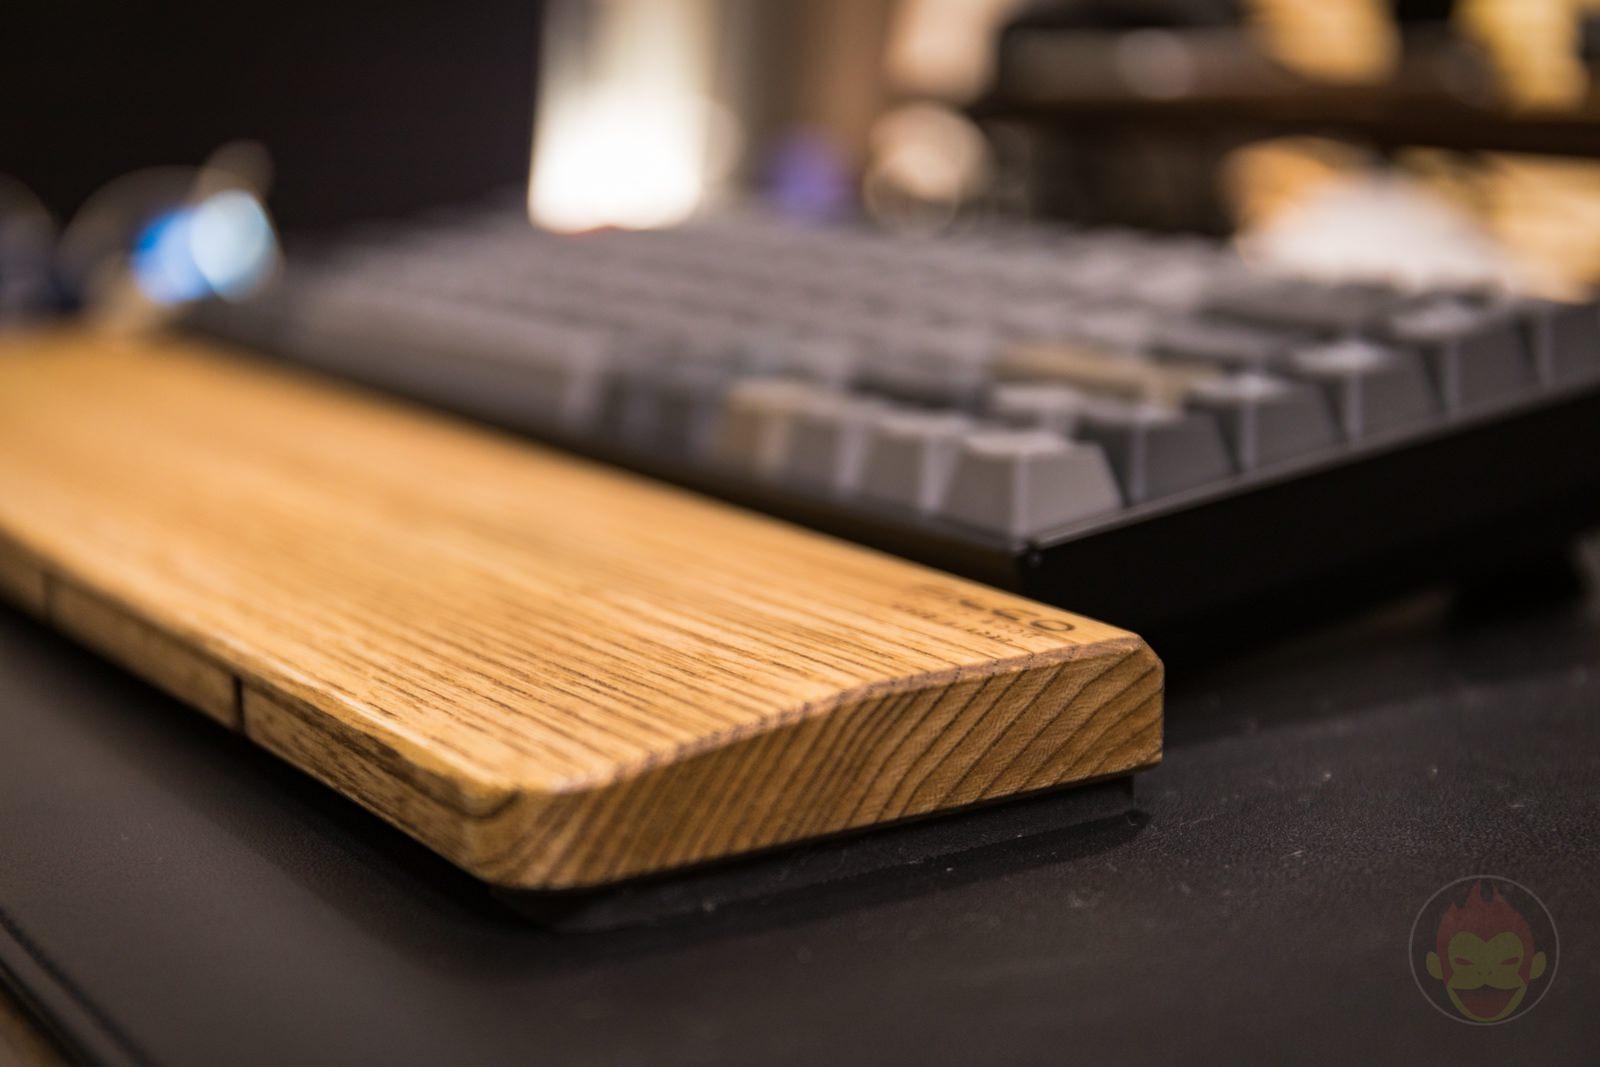 Keychron K2 Mechanical Keyboard Review 02